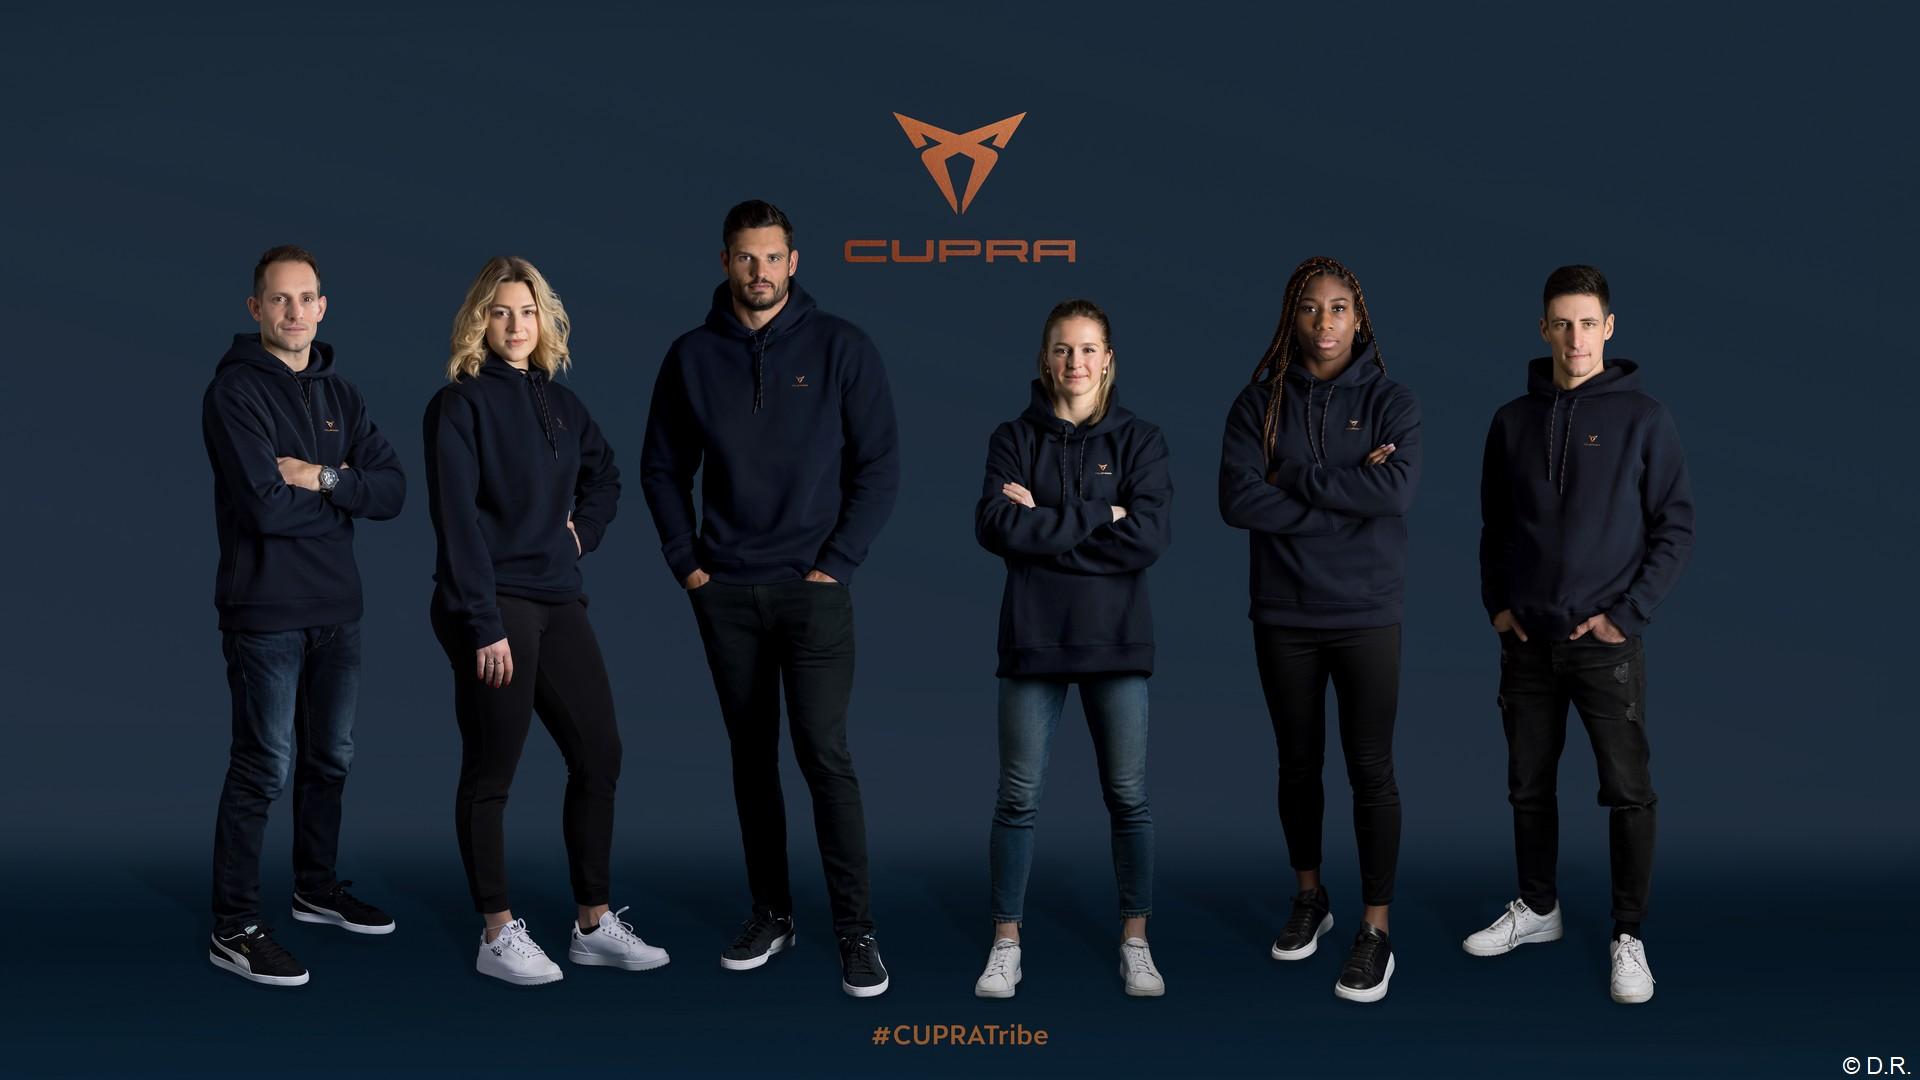 Cupra x Team athlètes 2021